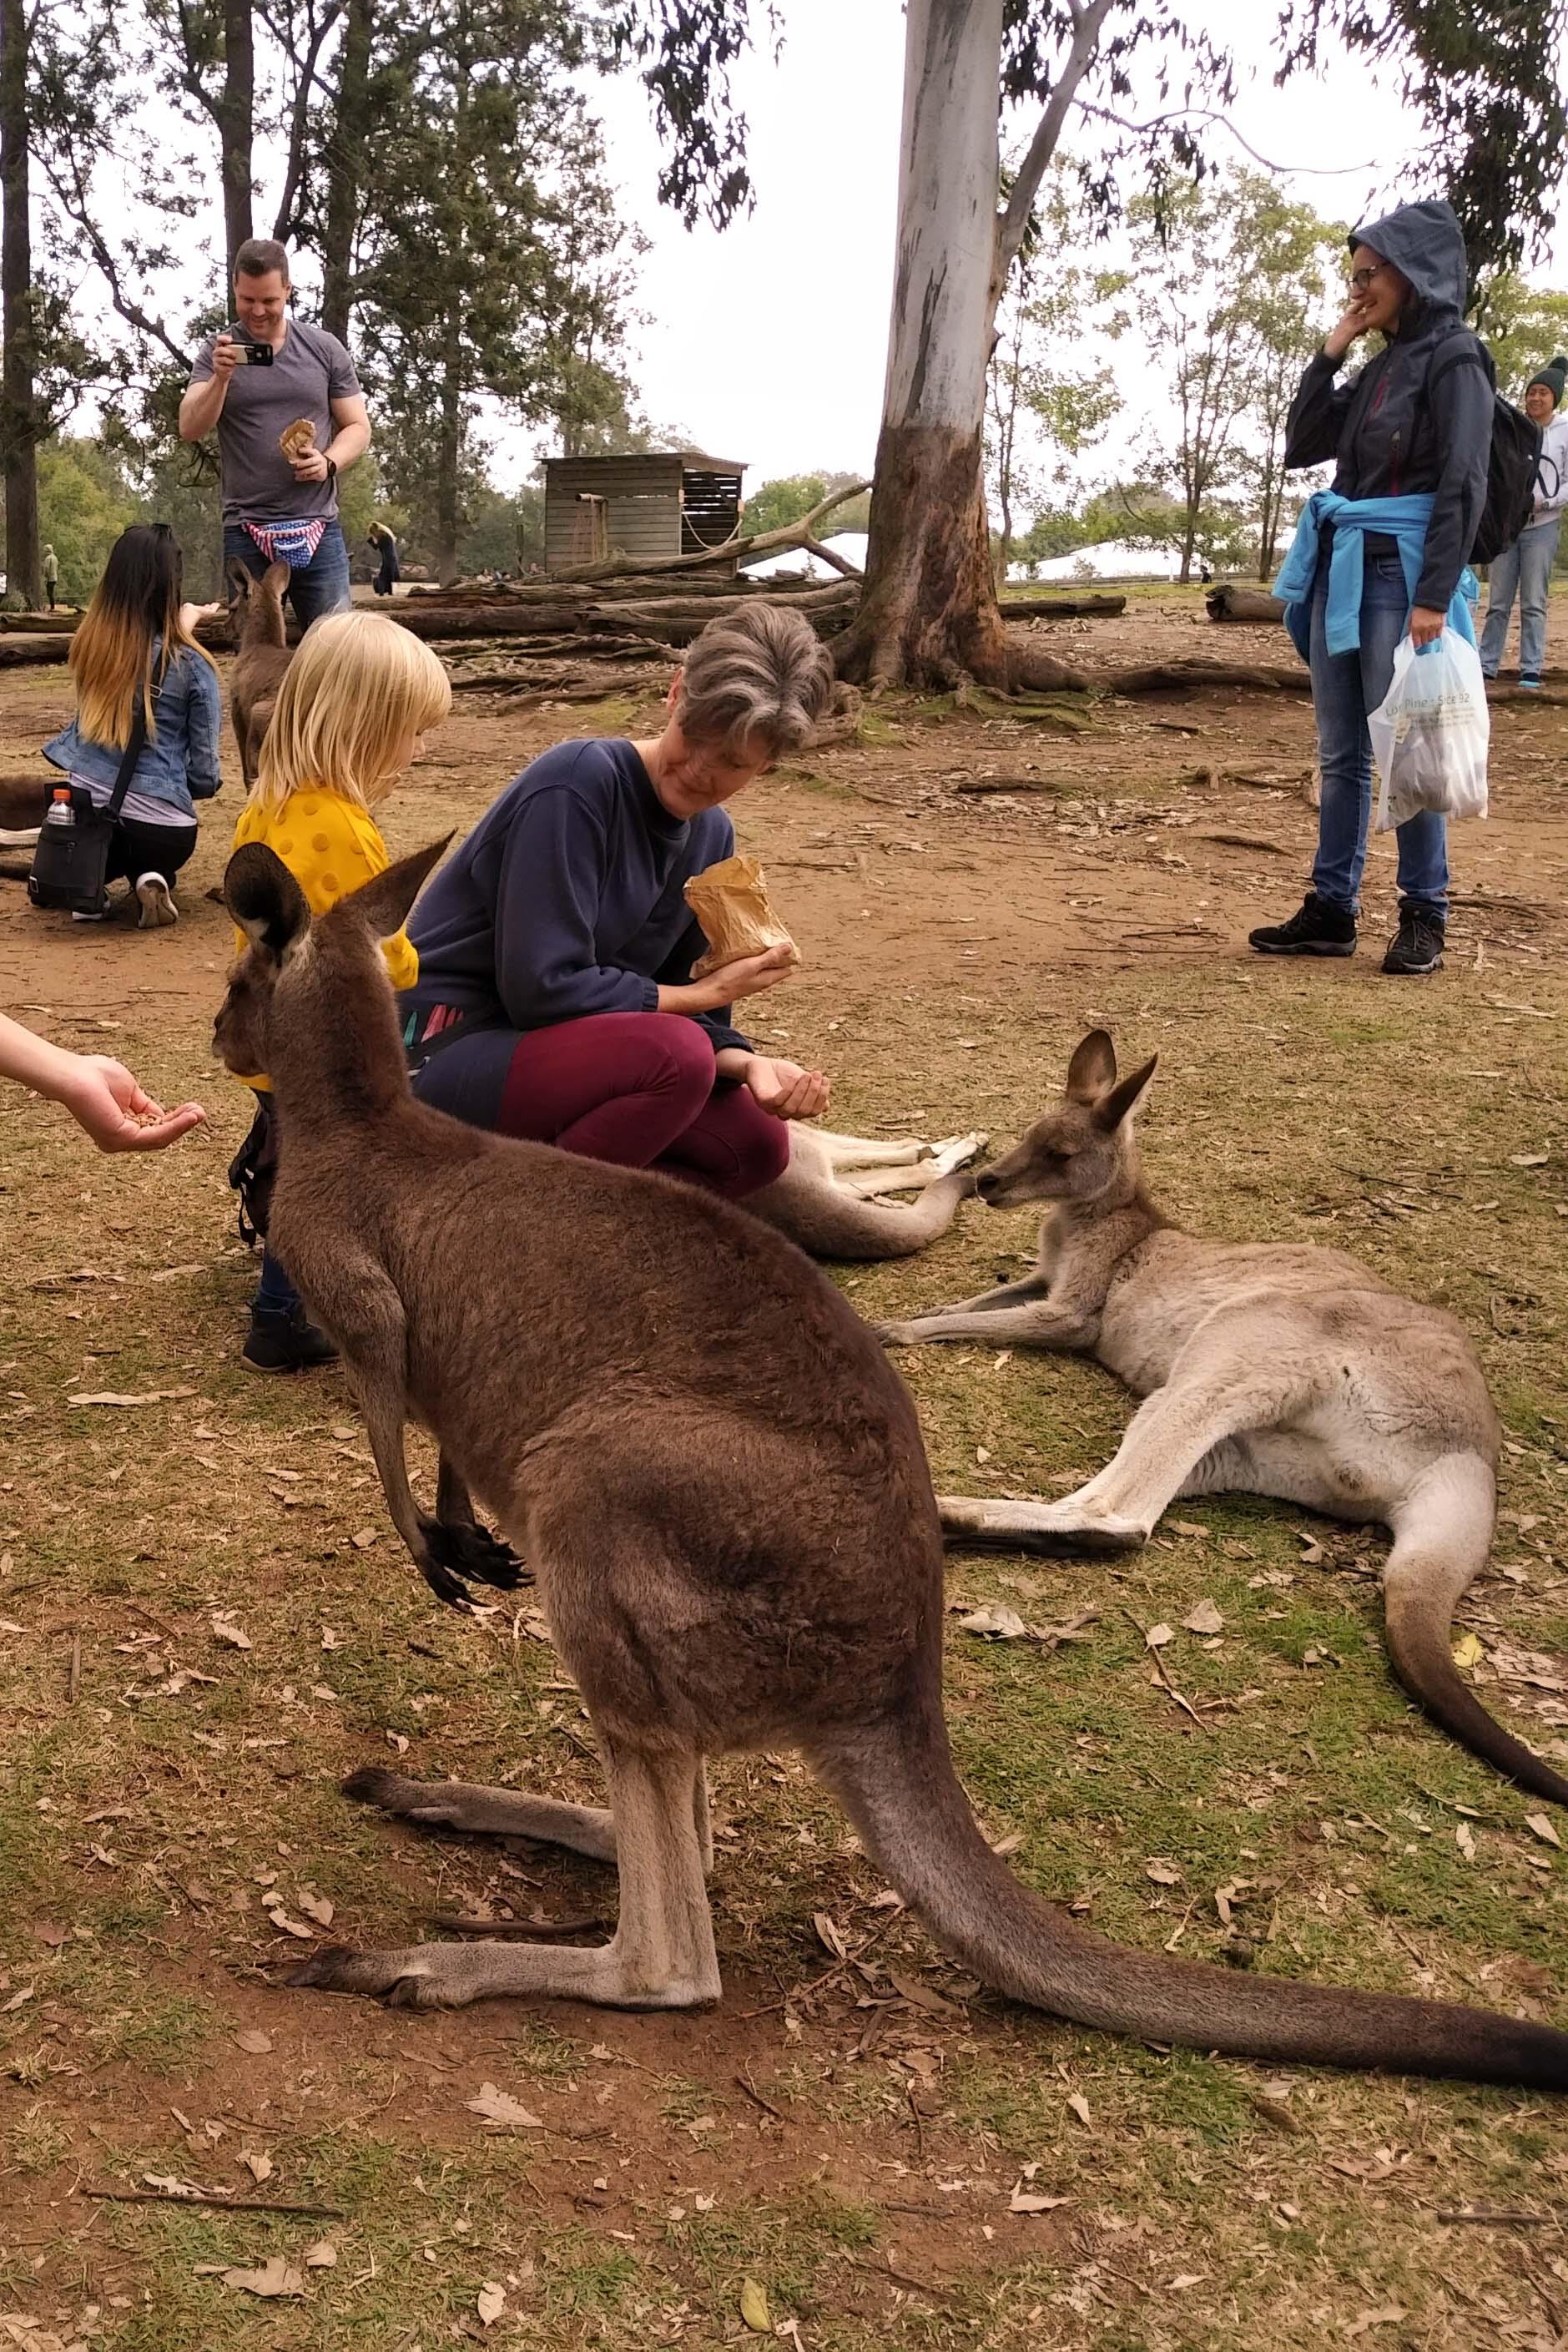 Kangaroo at Lone Pine Koala Sanctuary